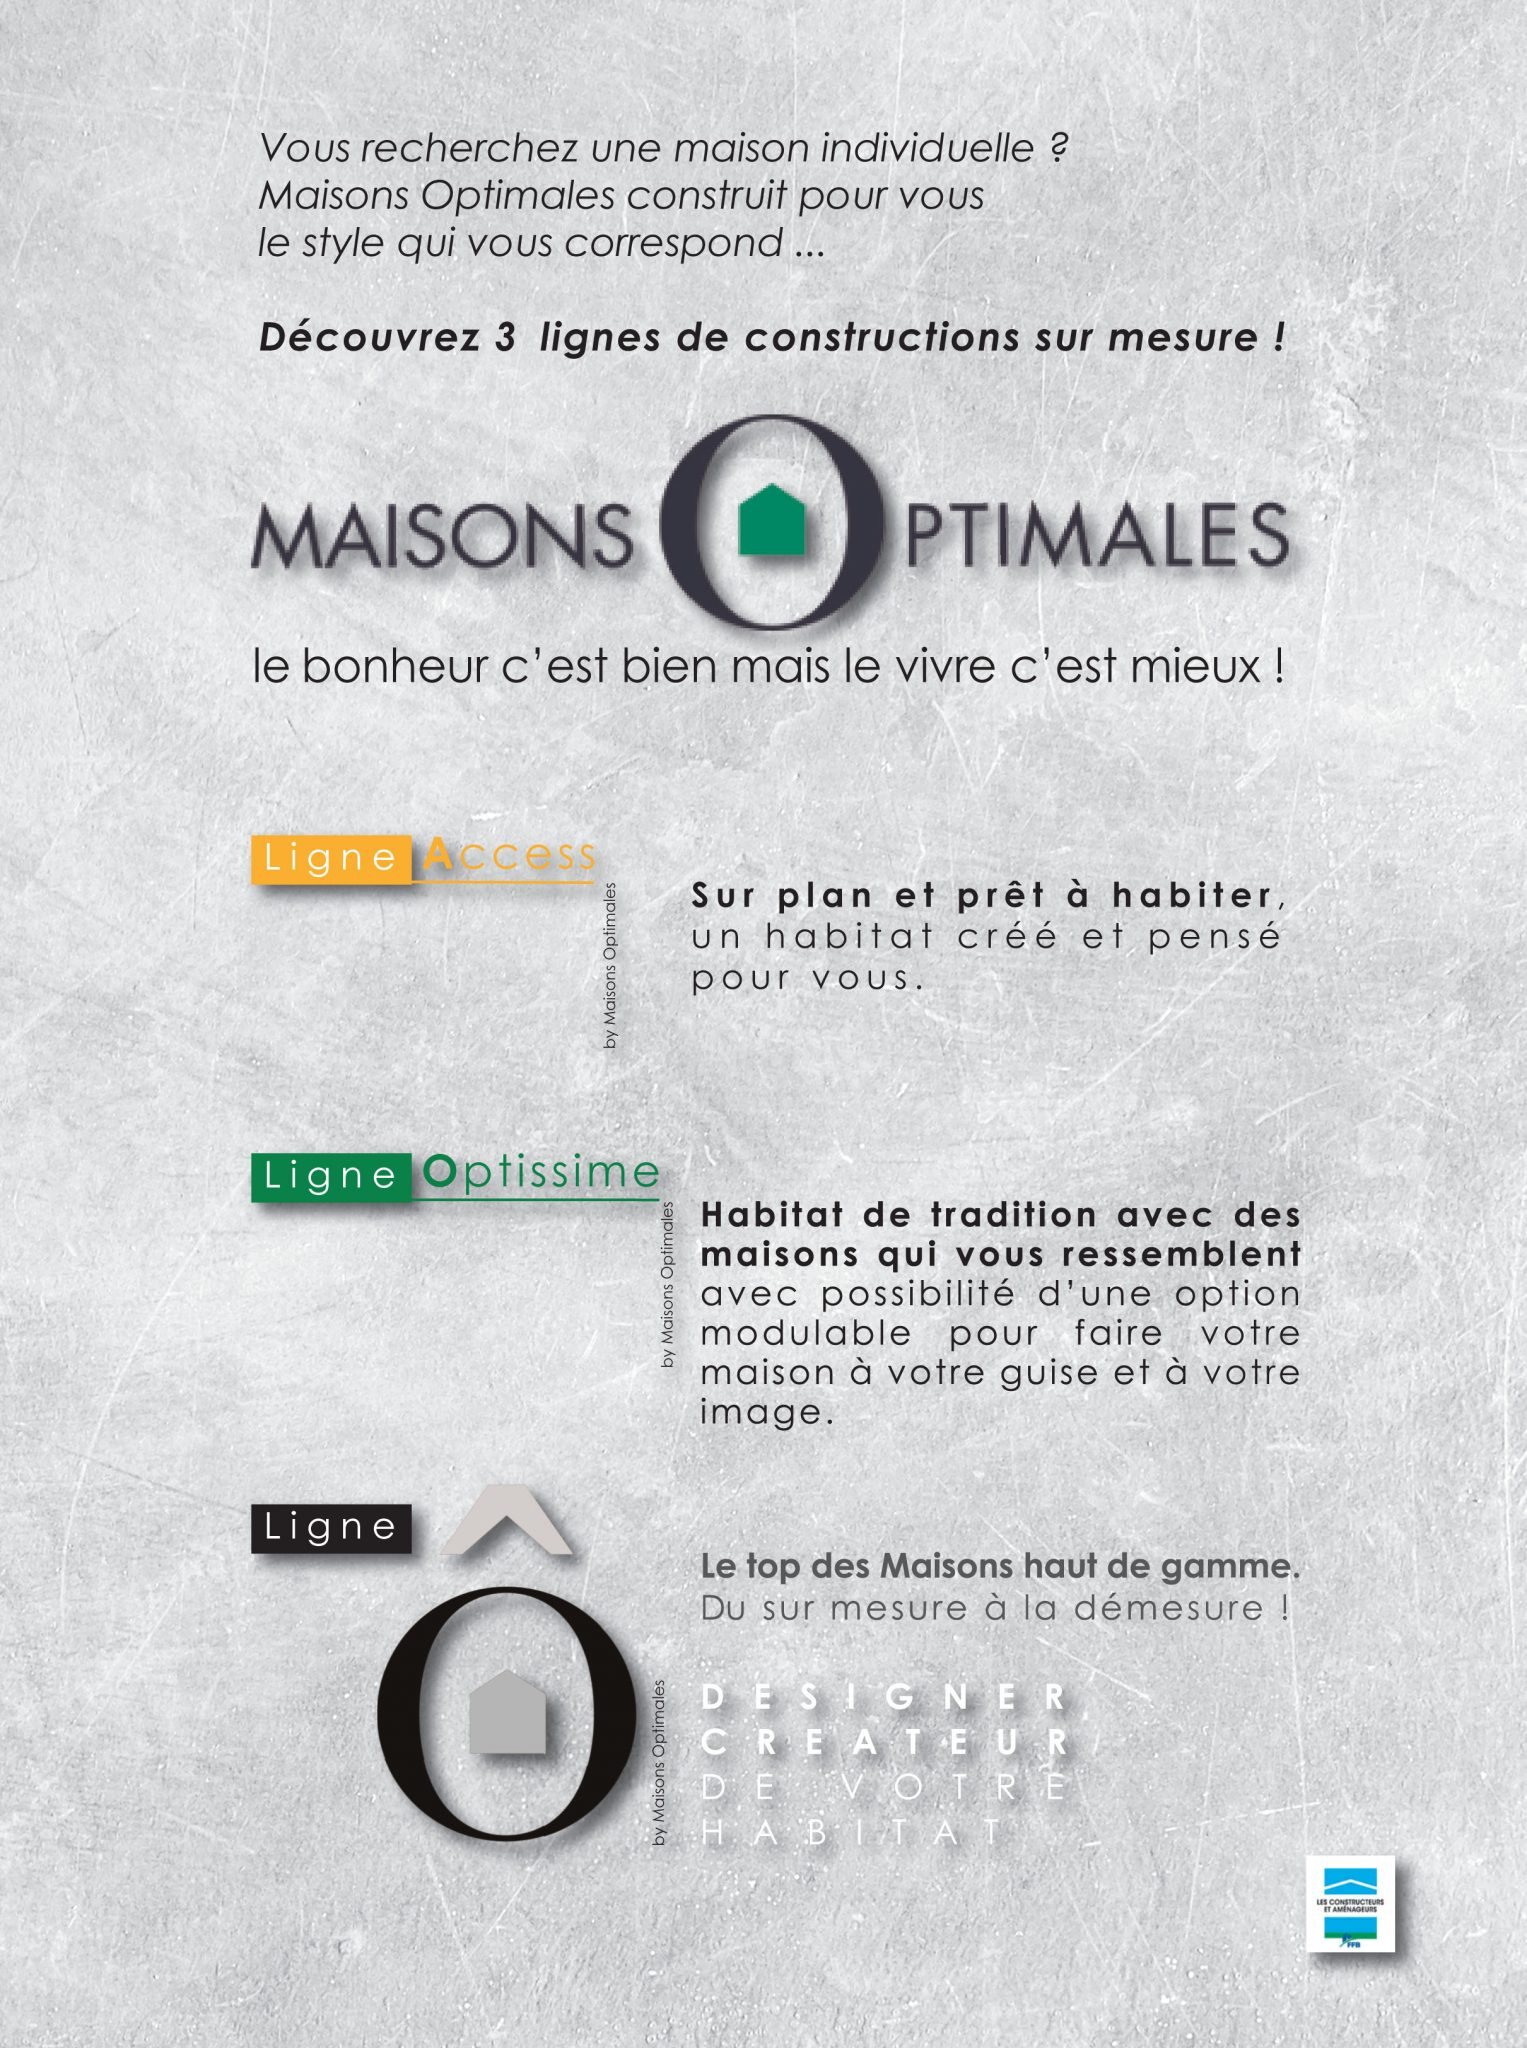 Lignes de collections by maisons optimales maisons optimales - Maisons optimales ...